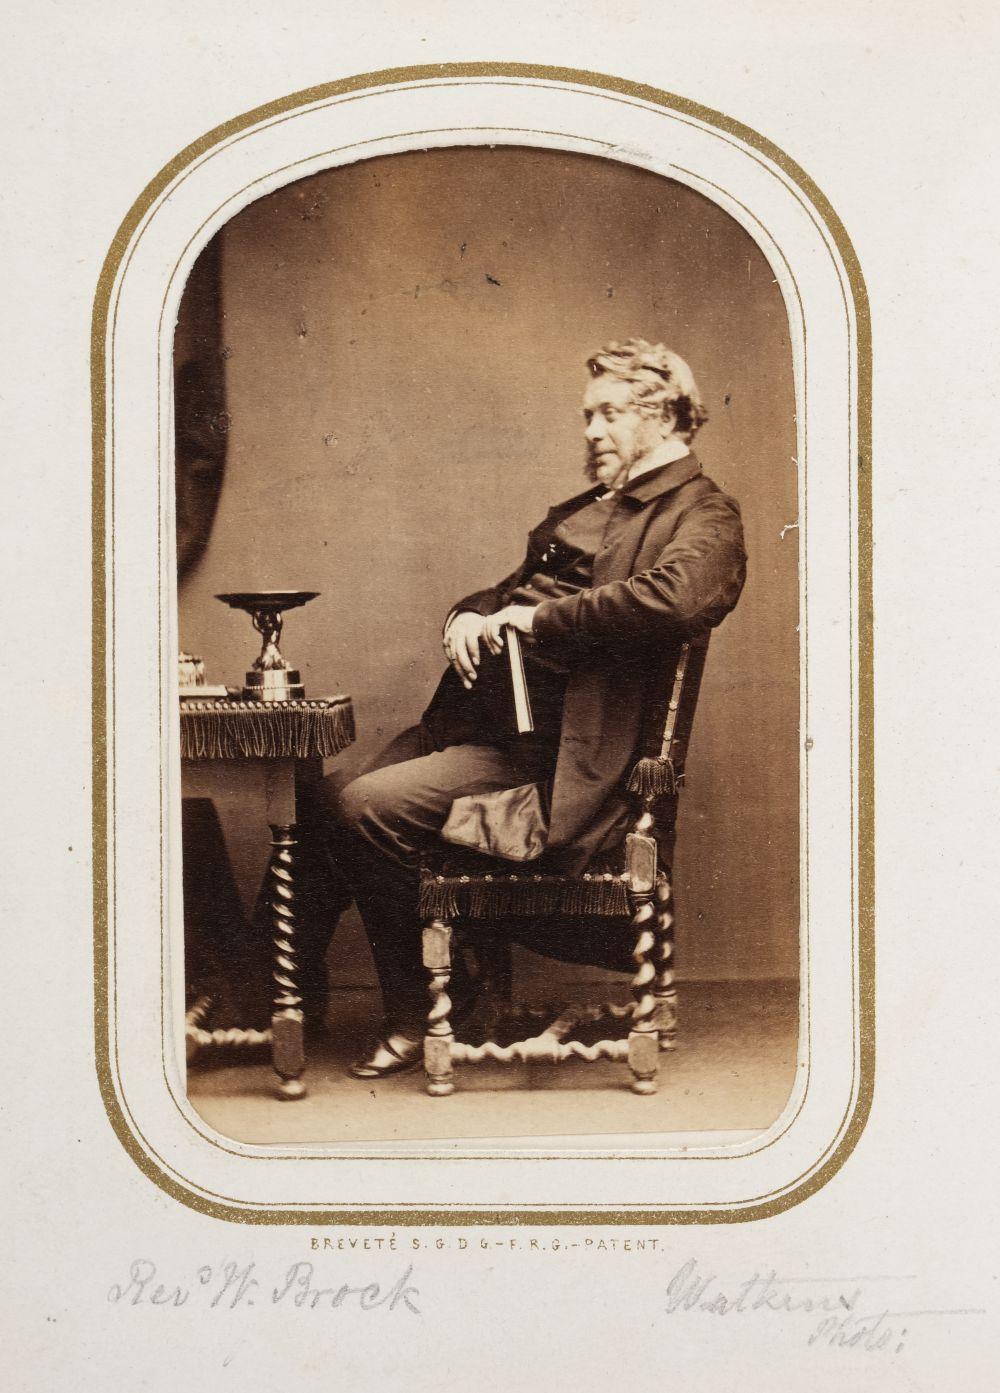 * Cartes de visite. A cartes-de-visite album, c. 1860s/1880s